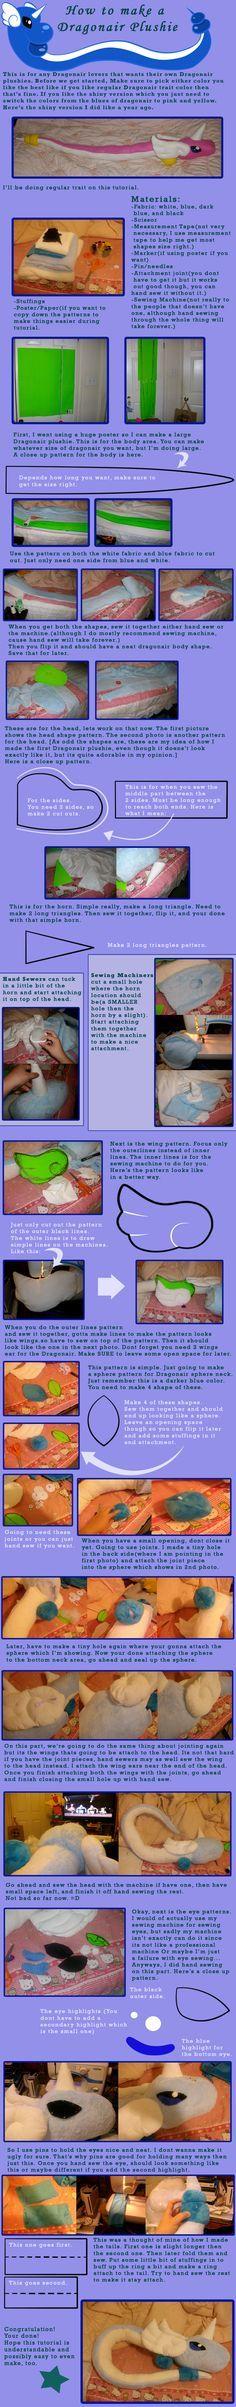 How to Make a Dragonair Plush by saiyamewome.deviantart.com on @deviantART